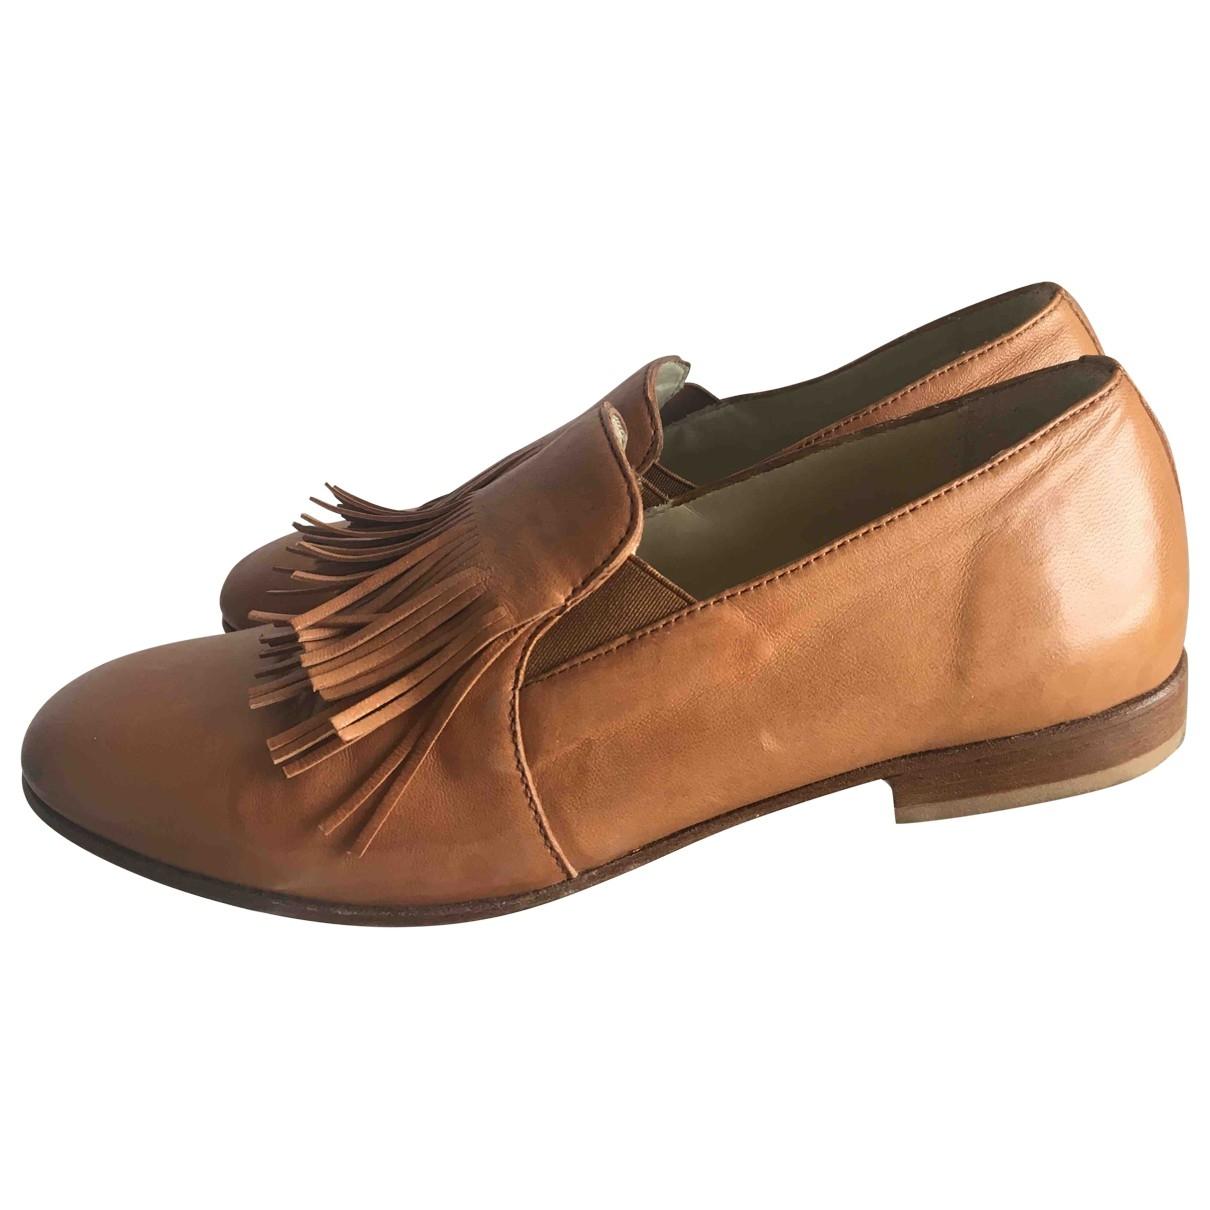 Non Signé / Unsigned \N Camel Leather Espadrilles for Women 37.5 EU